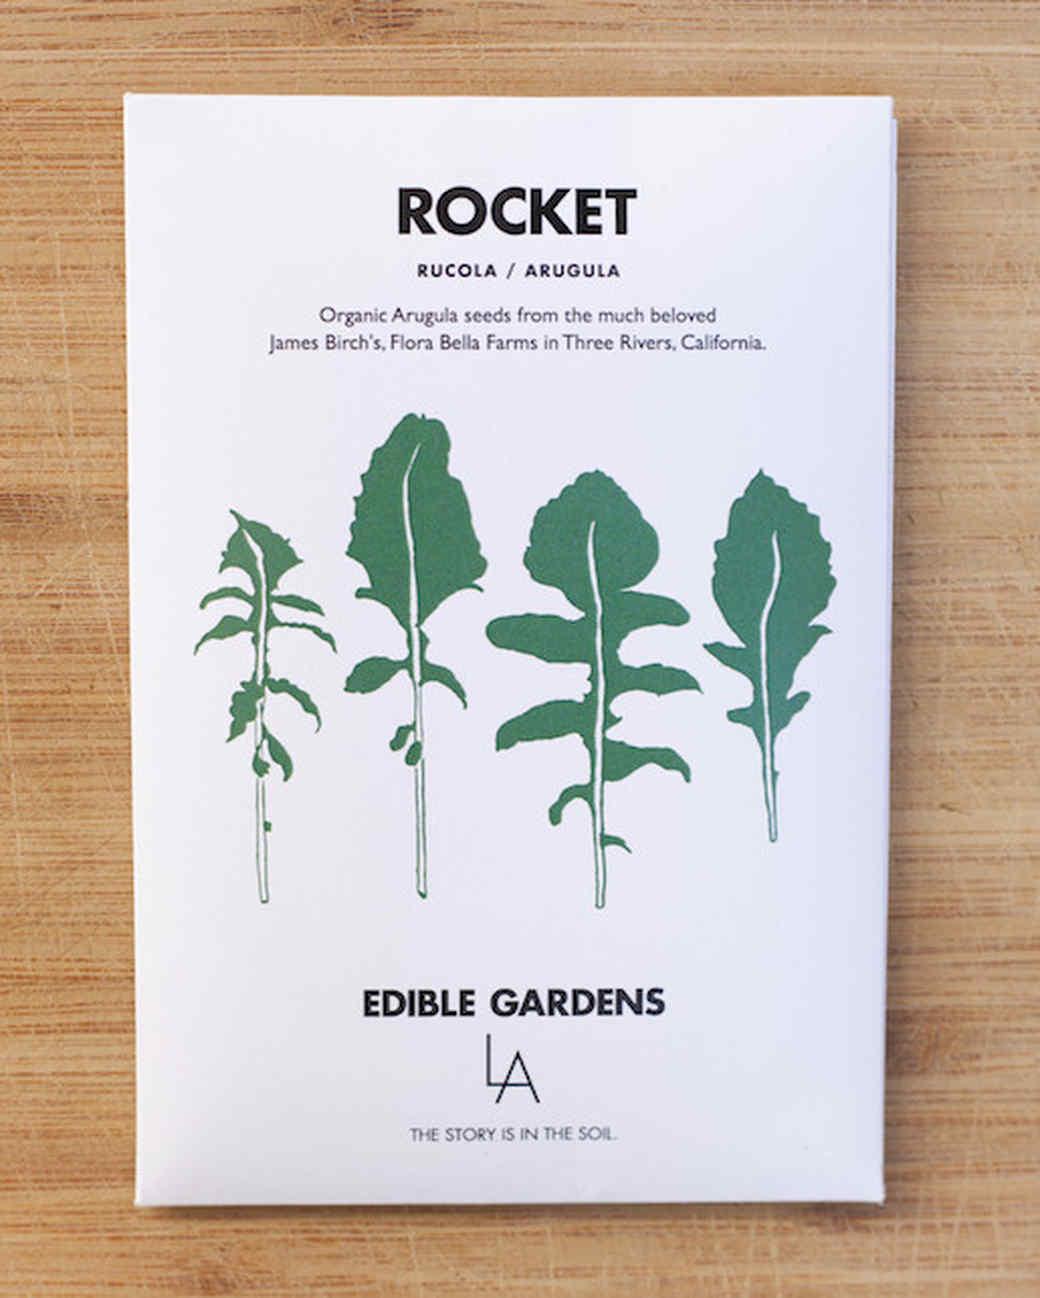 edible gardens rocket seed packet